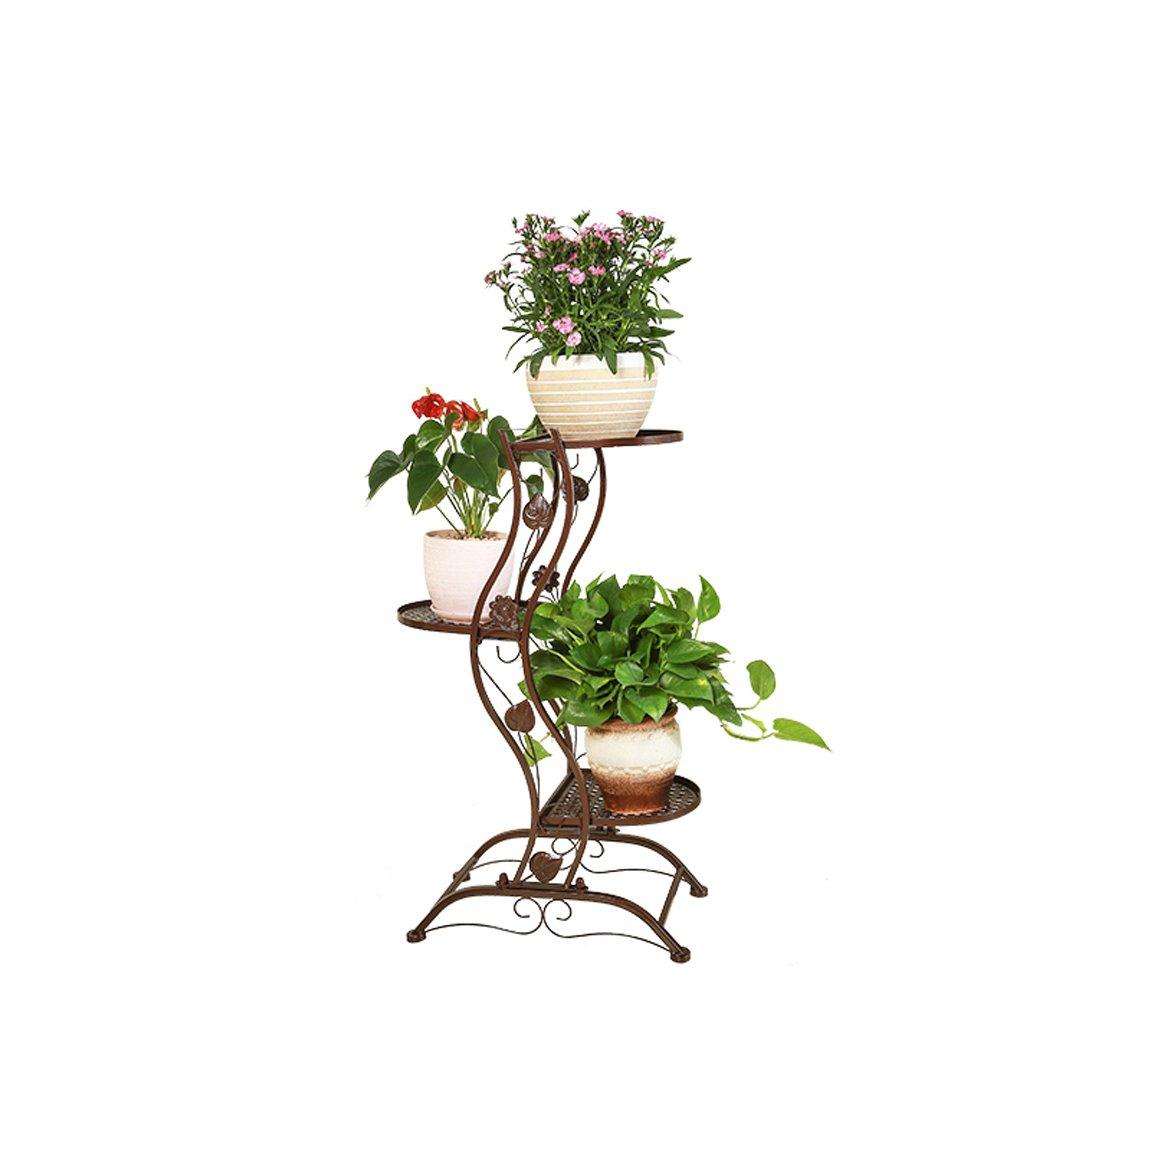 LRW European Flower Rack, Iron Art, Creativity, Green Lace, Chlorophytum, Floor, Multi-Storey Flower Rack Balcony, Fleshy Flower Rack, 3 Layers of Brown.